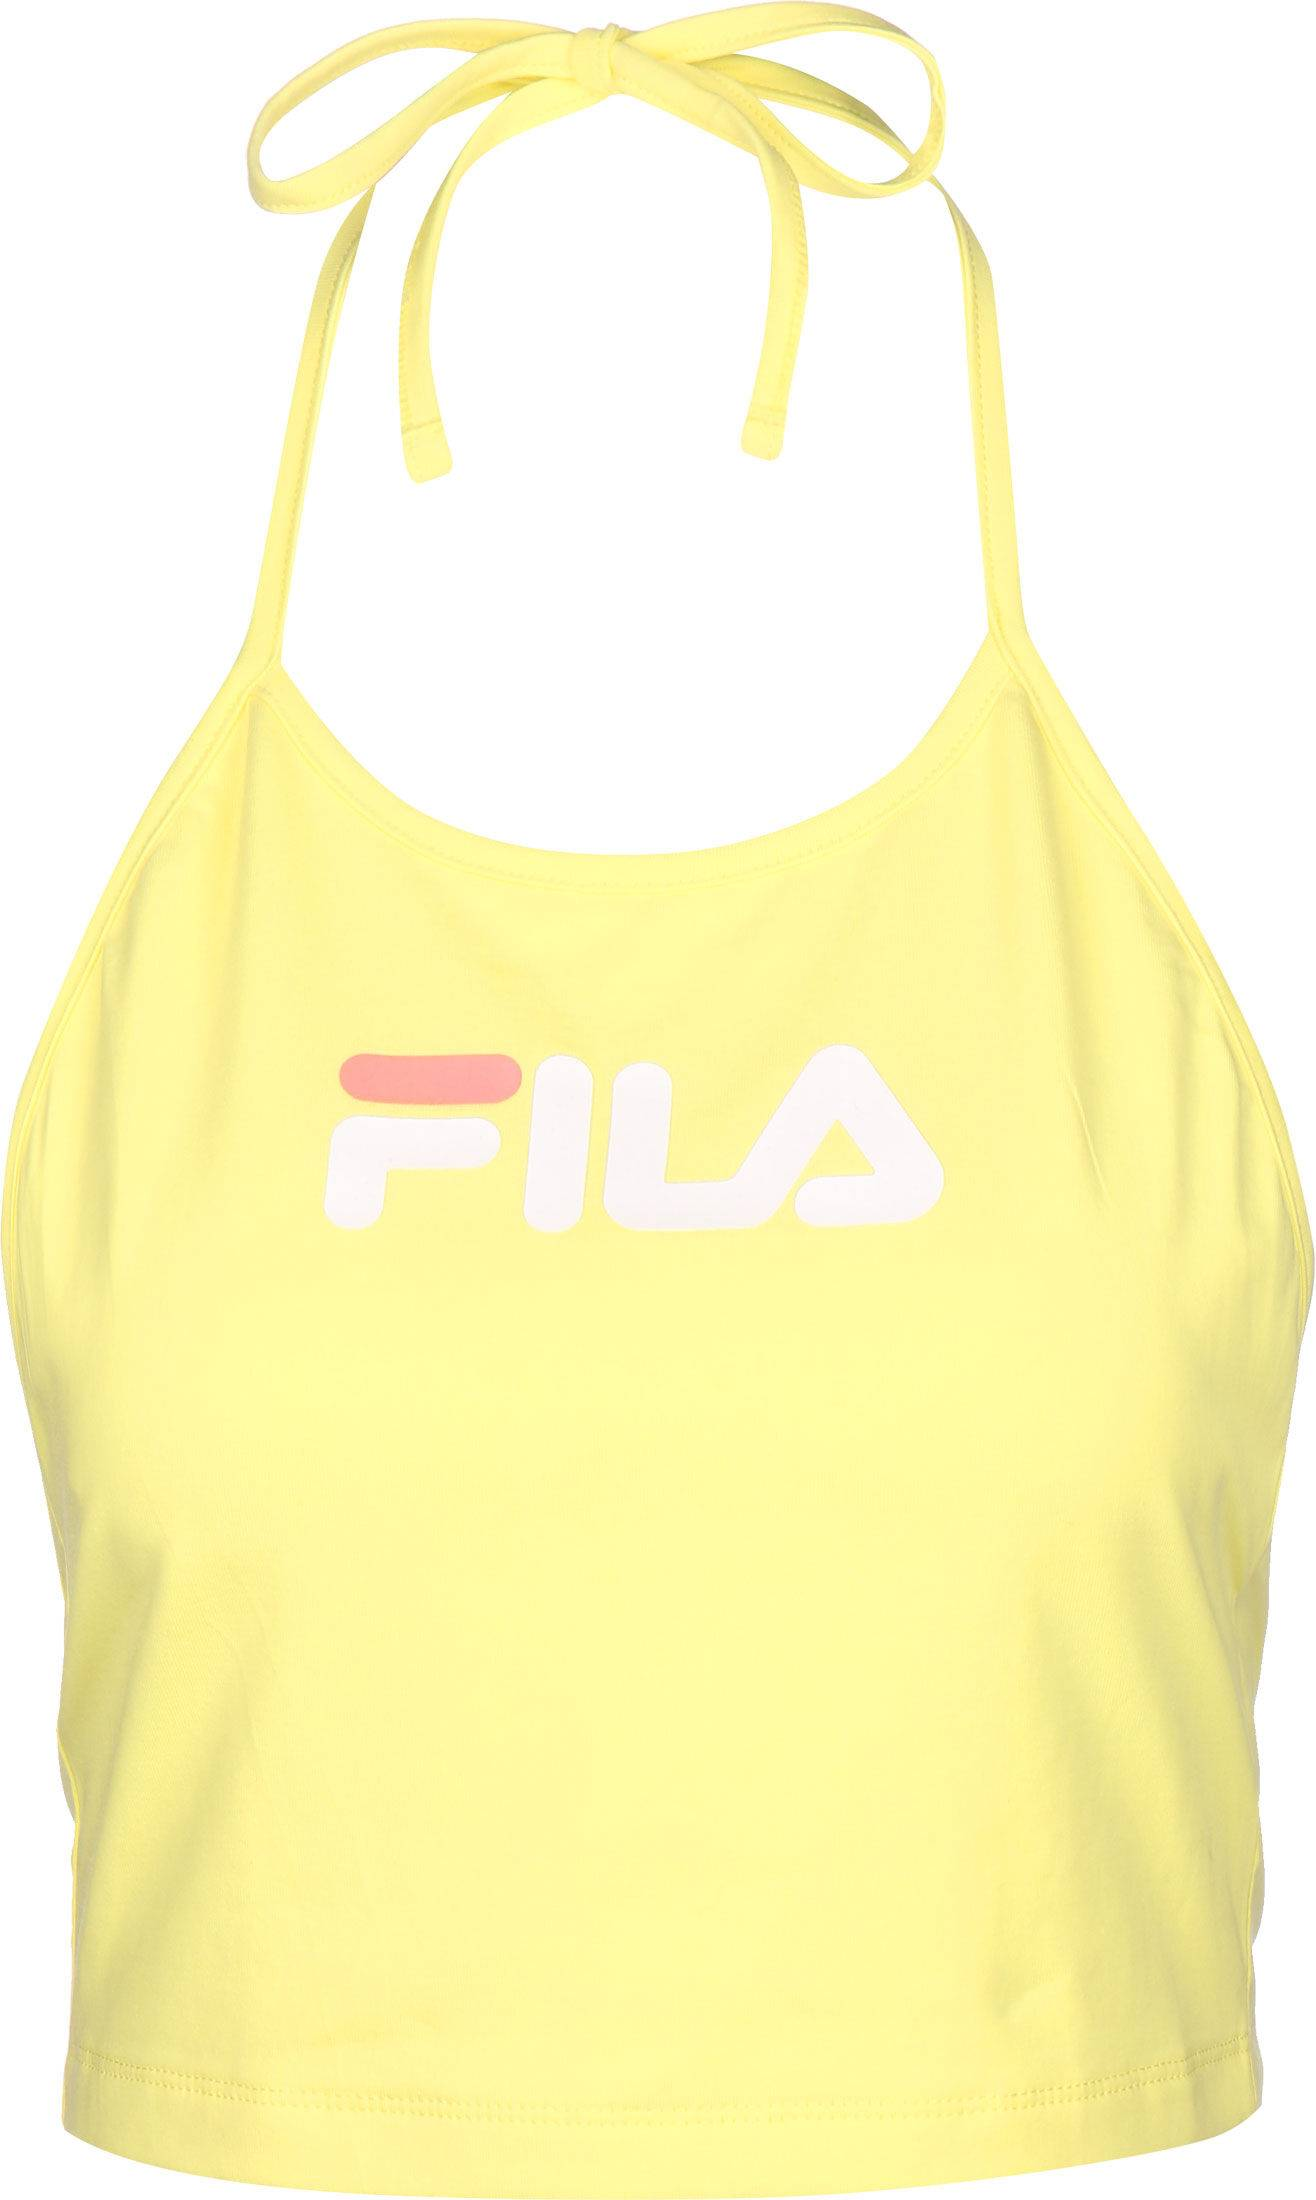 Fila Bebe, taille S, femme, jaune